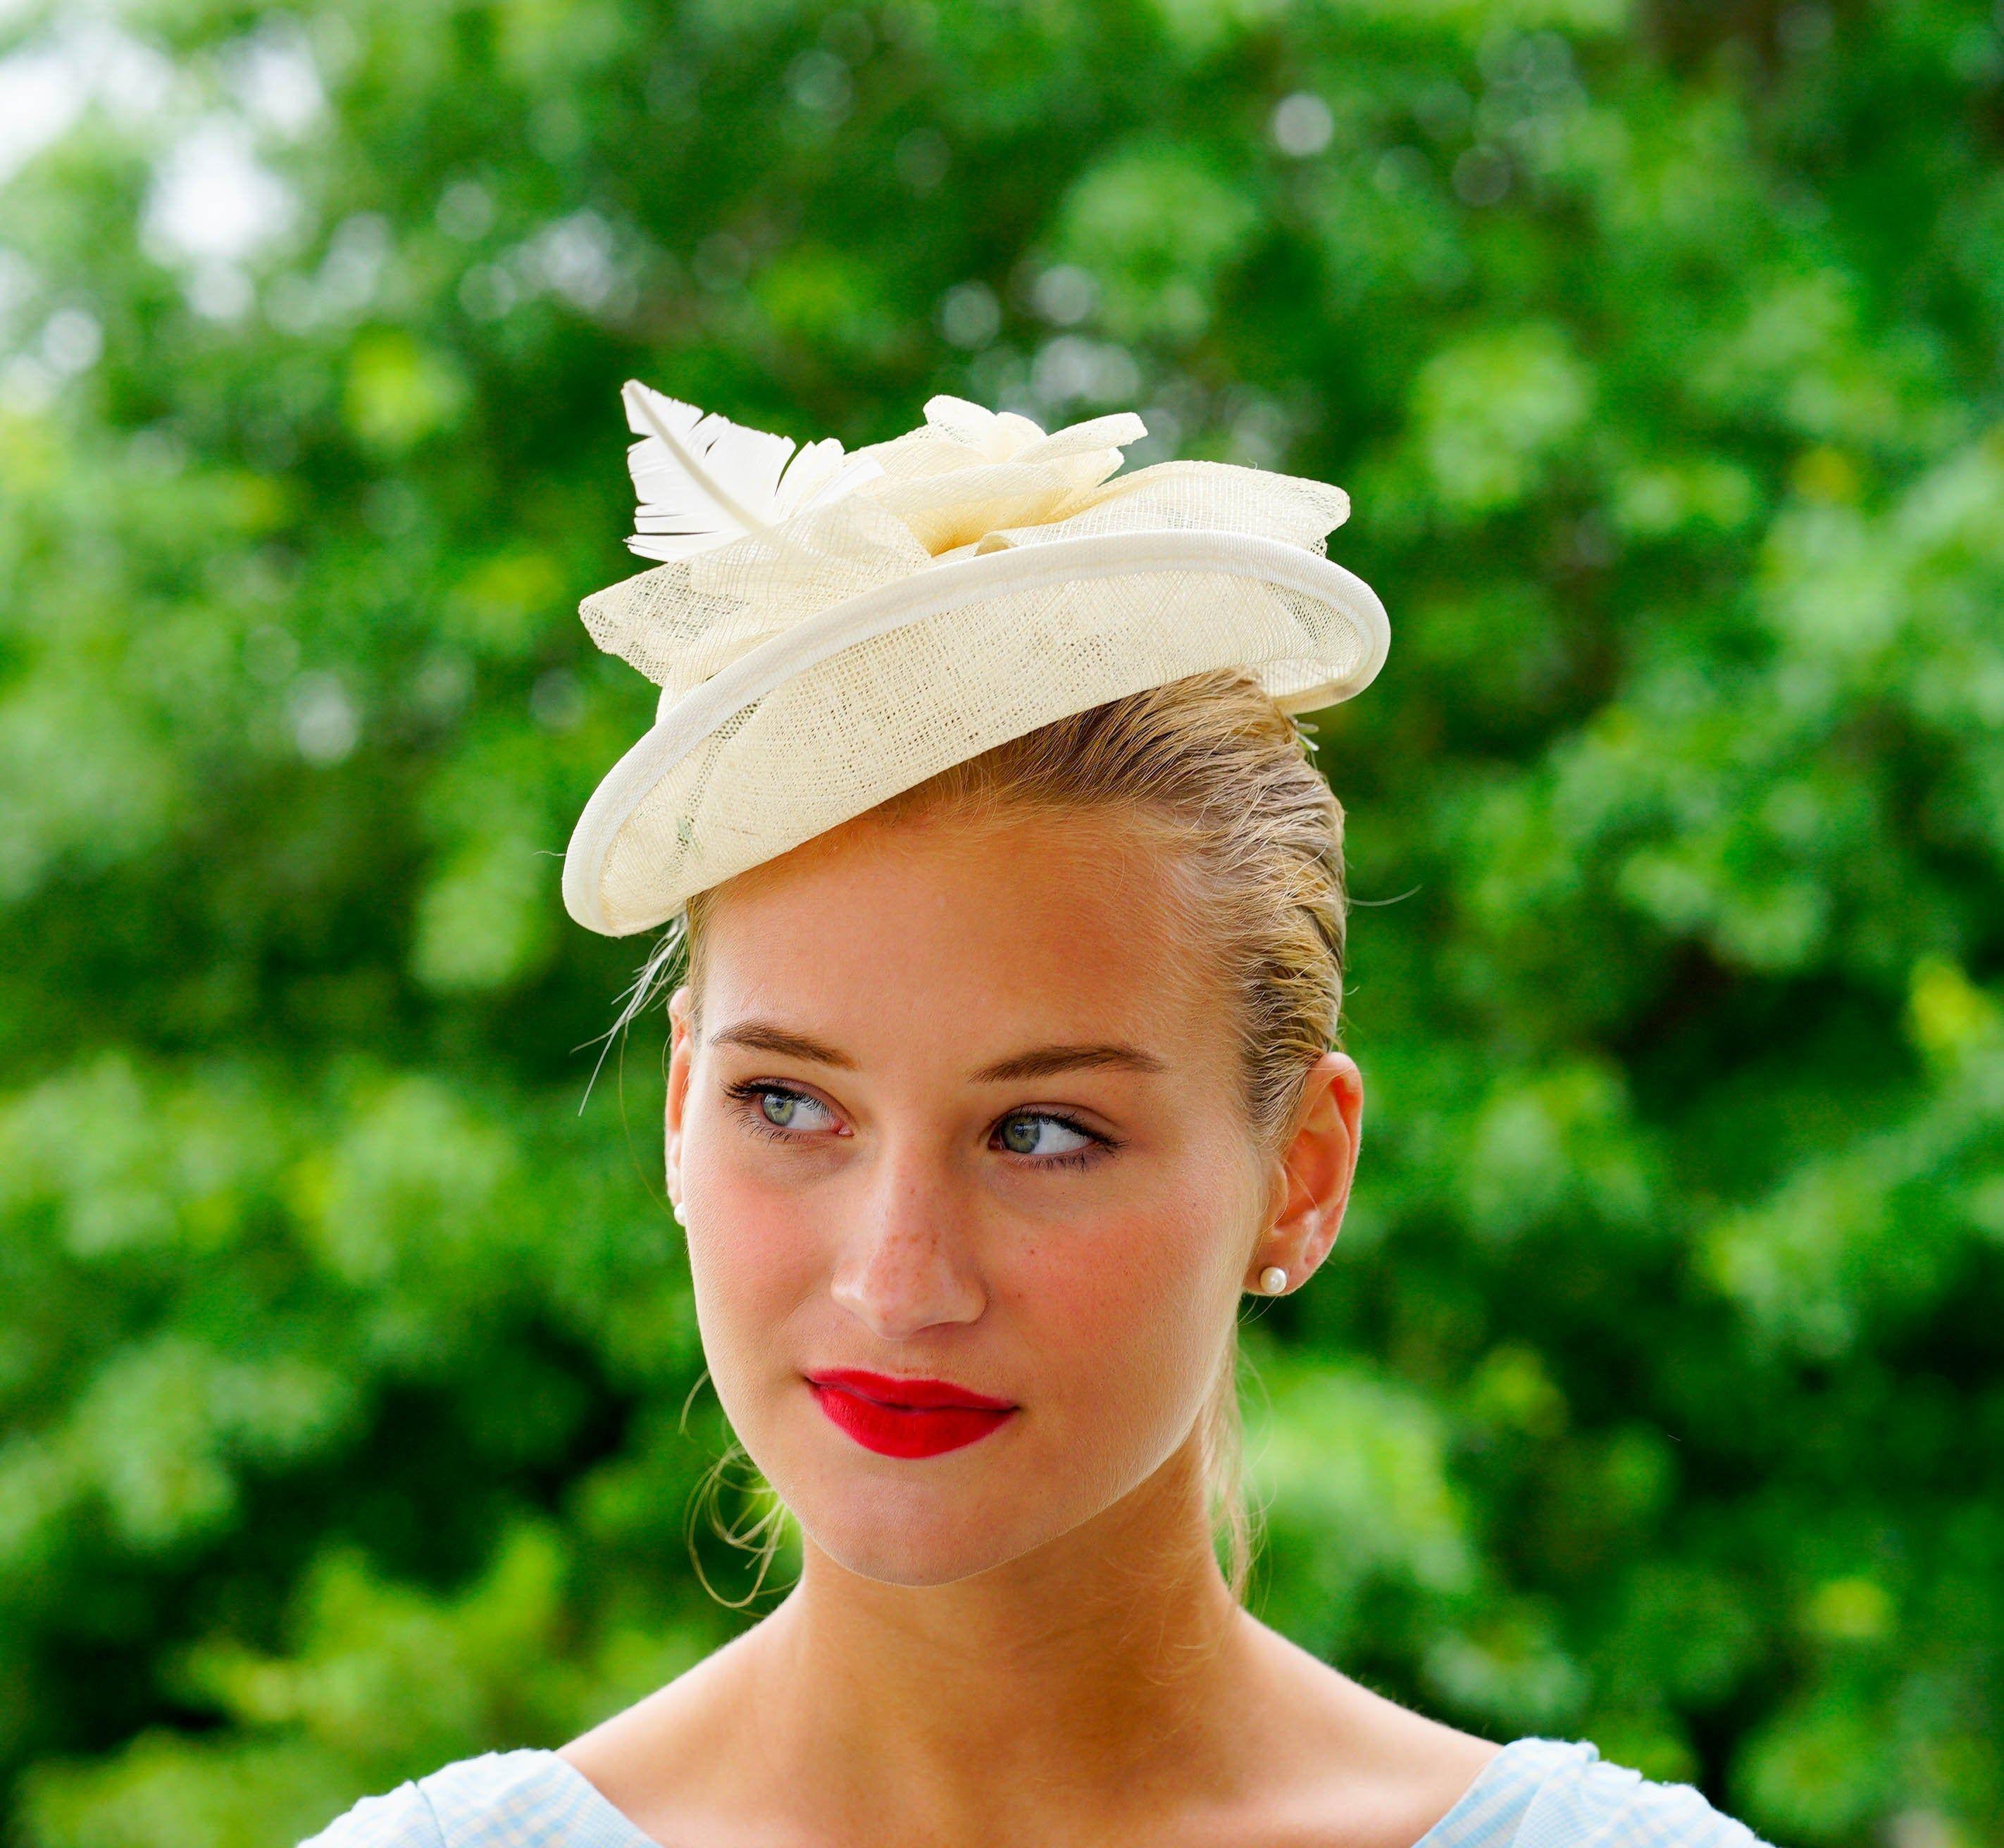 FS Beige Wedding Party Fascinator Cocktail Hat For Women